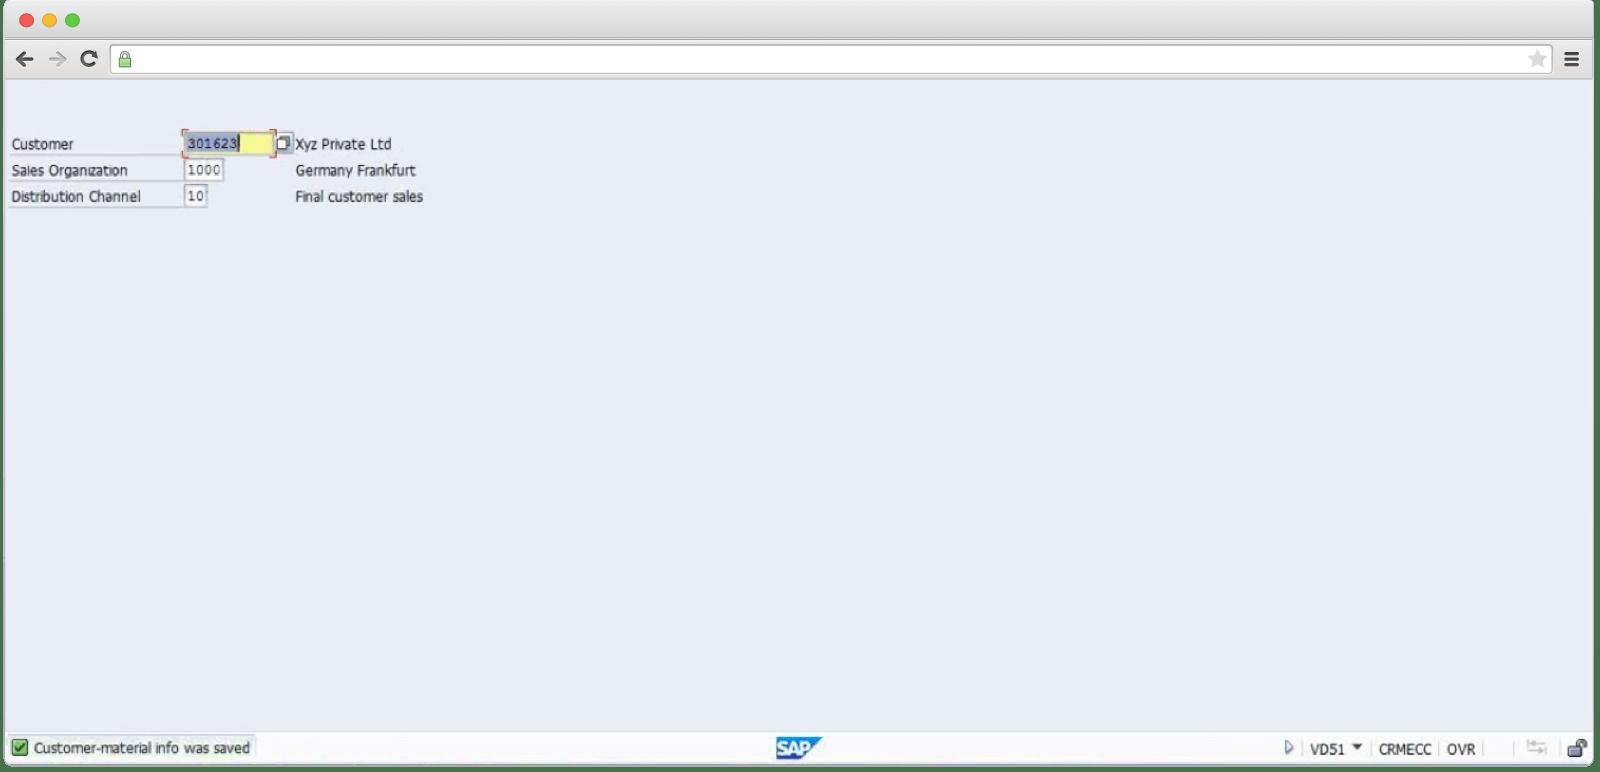 How SAP sales module looks like